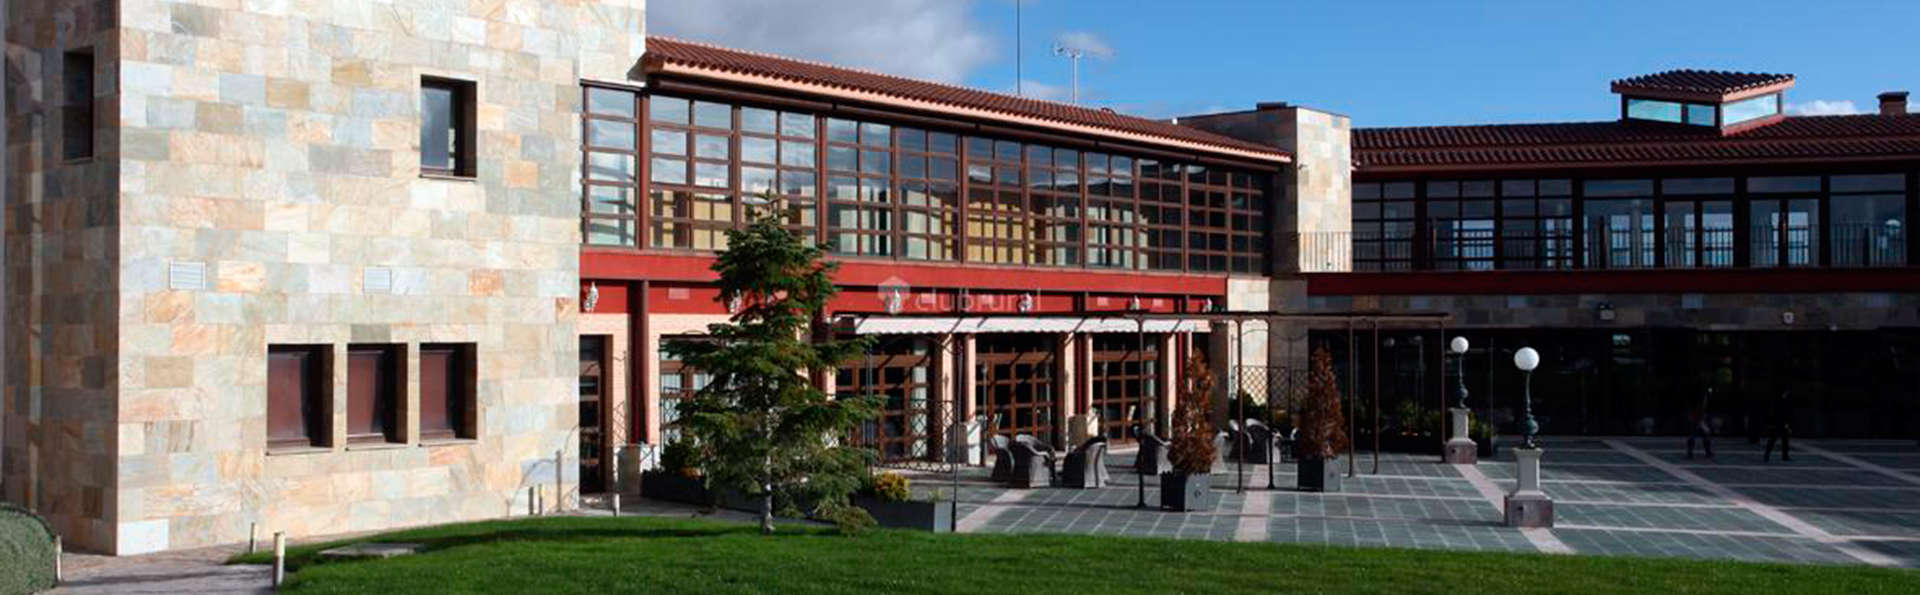 Hotel Villa Nazules Hípica Spa - EDIT_front.jpg